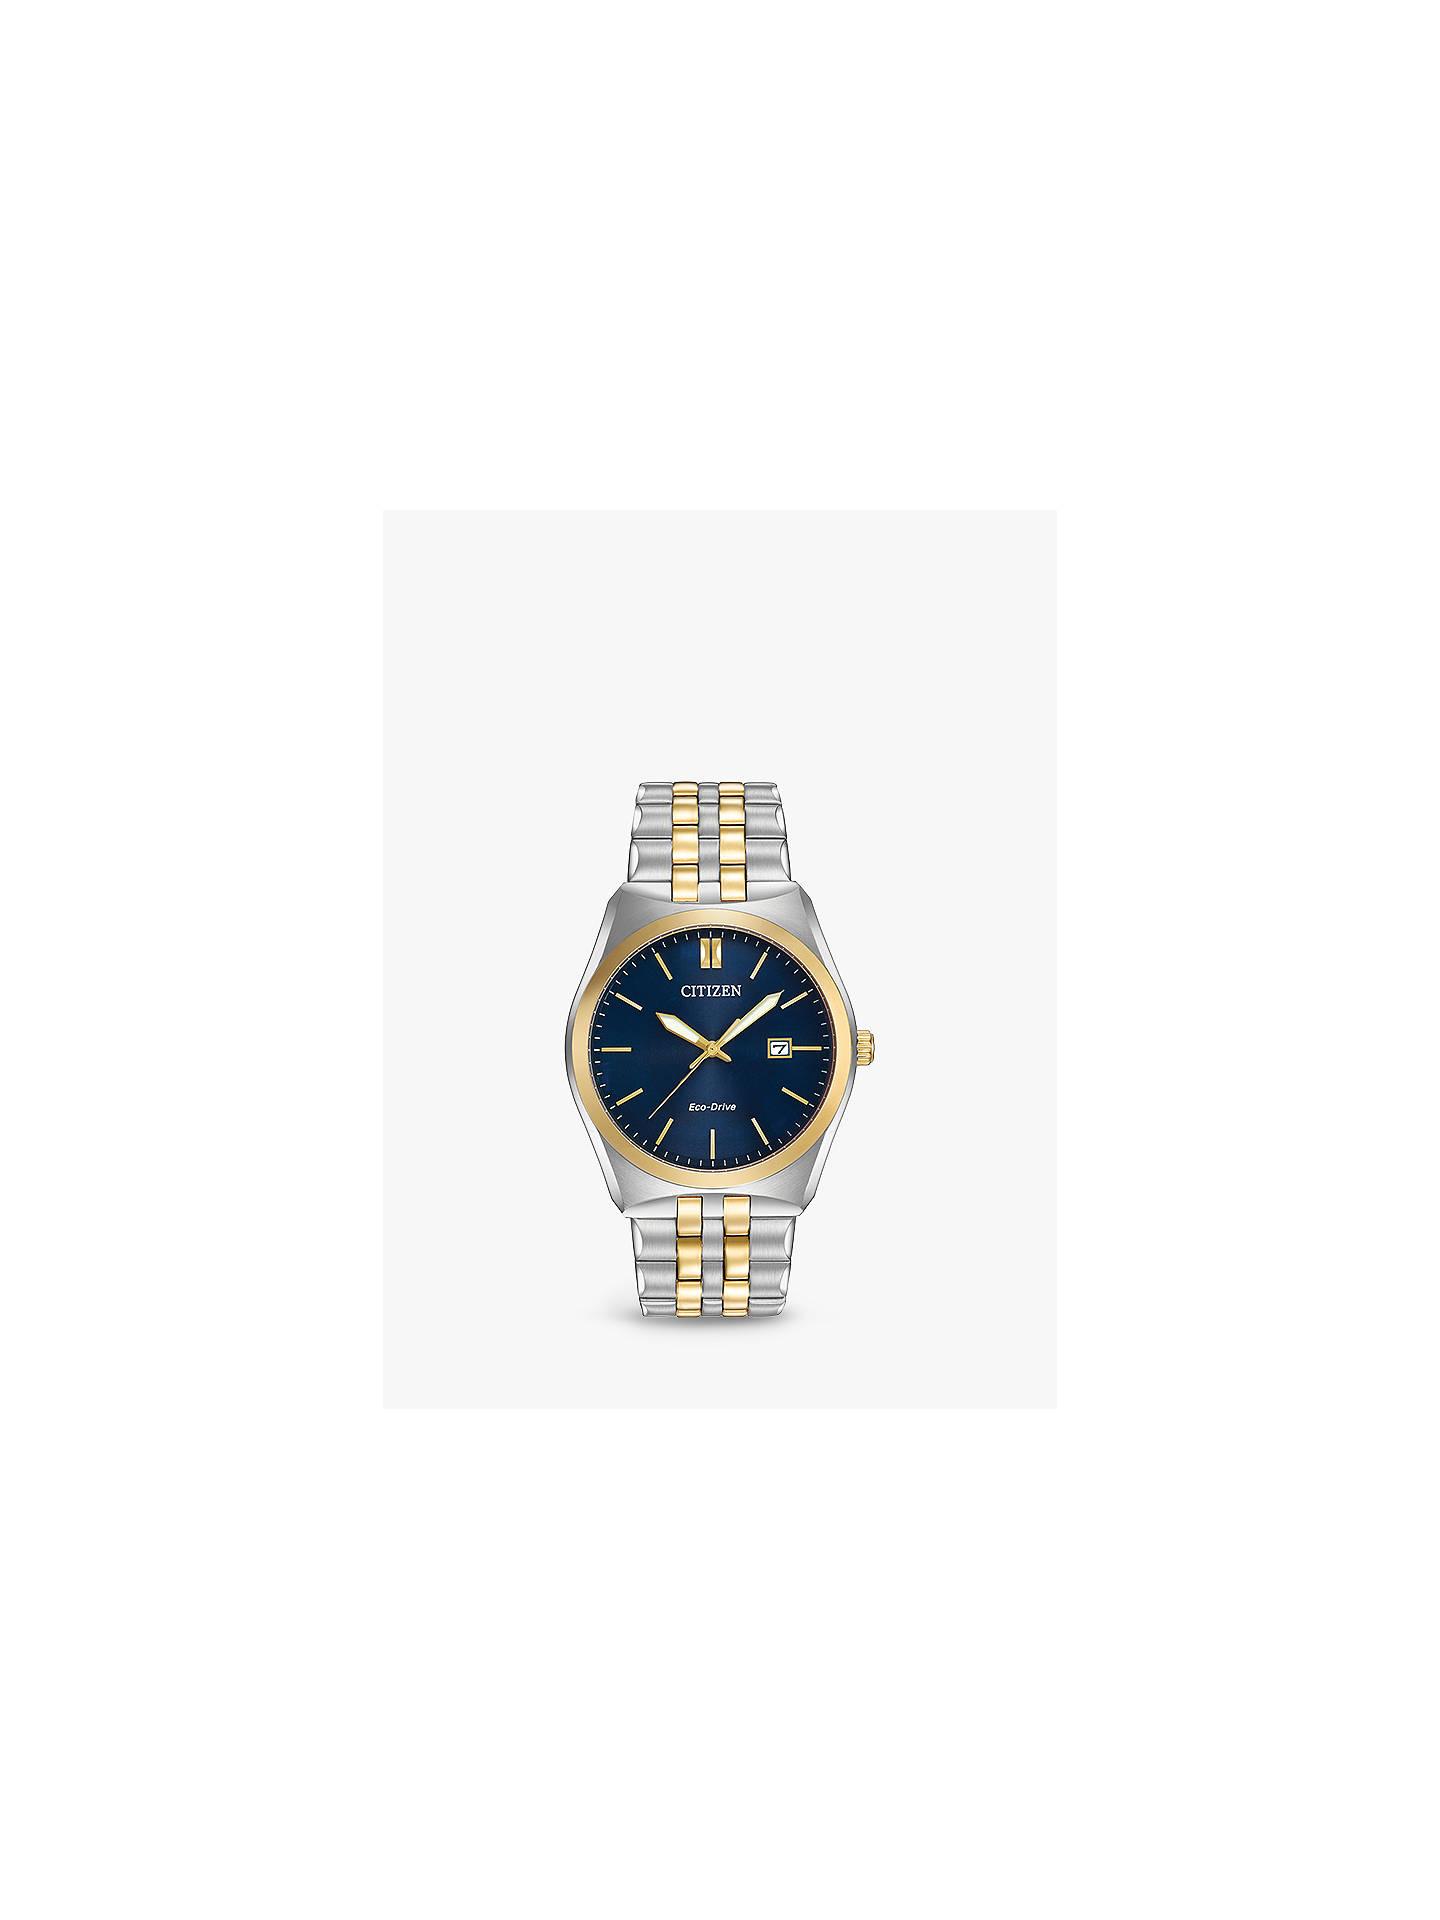 e2722a2090bb7 Citizen Men s Corso Date Bracelet Strap Watch at John Lewis   Partners